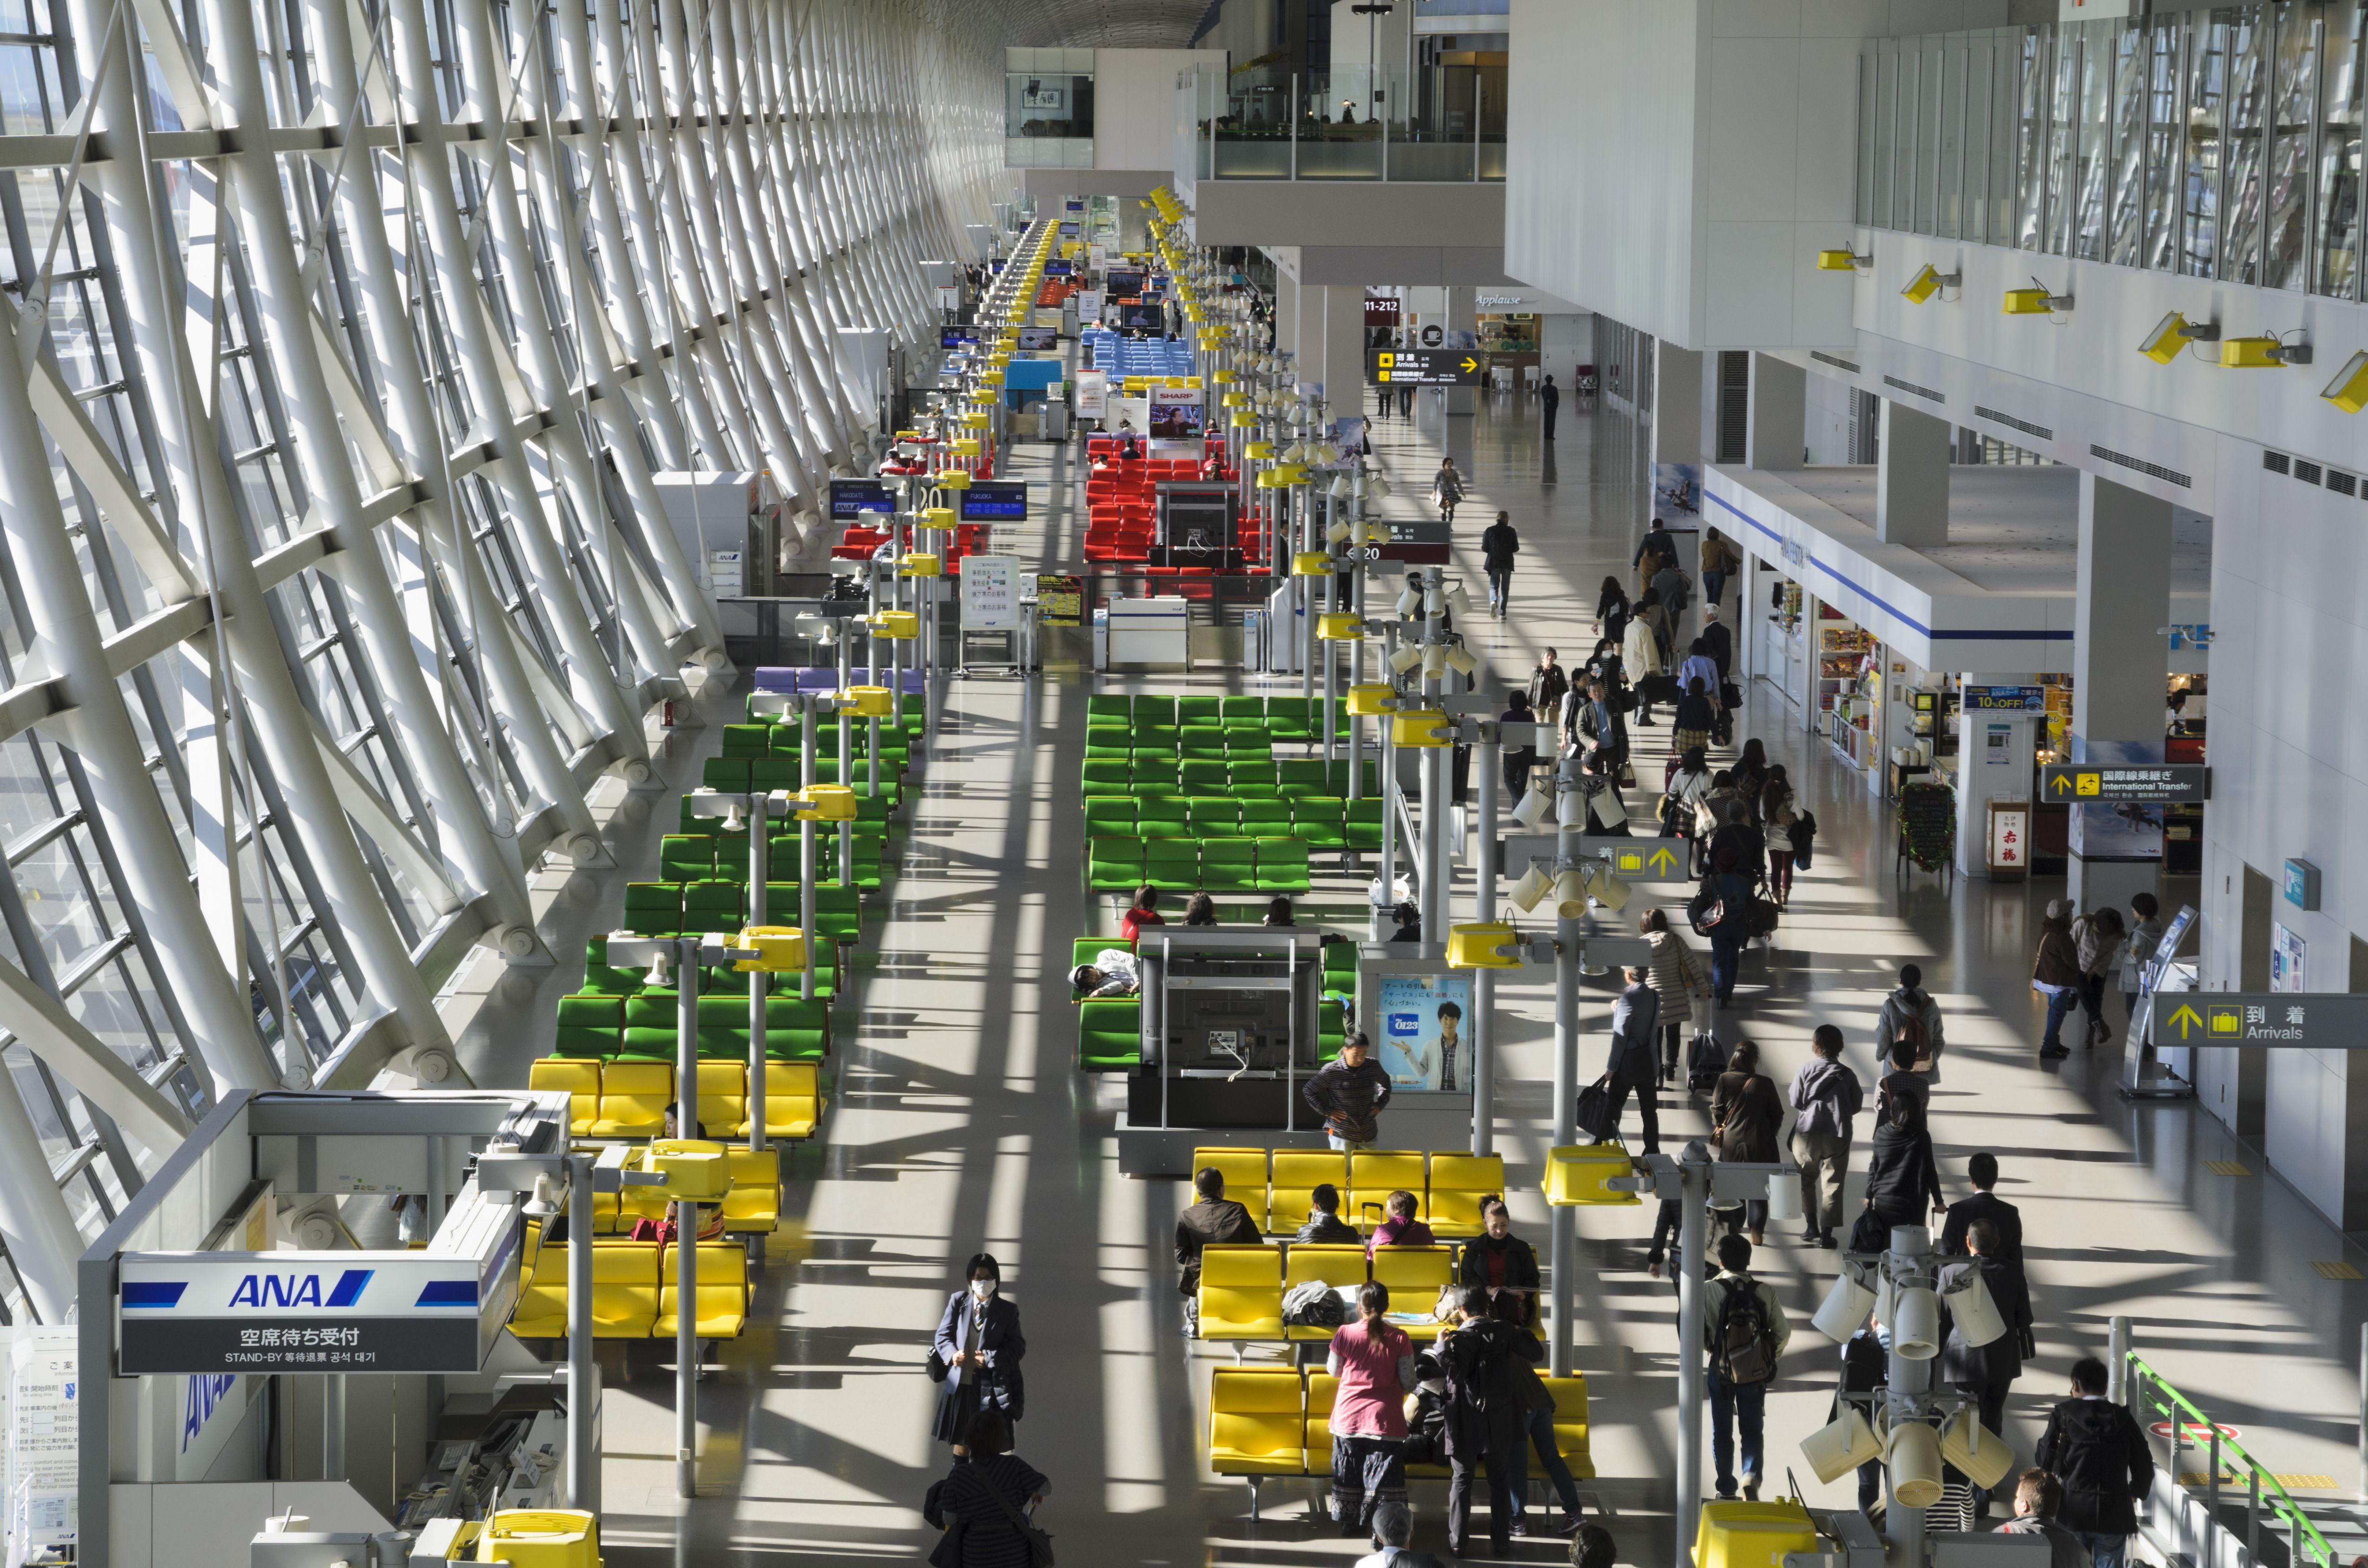 Kansai Airport, Japan